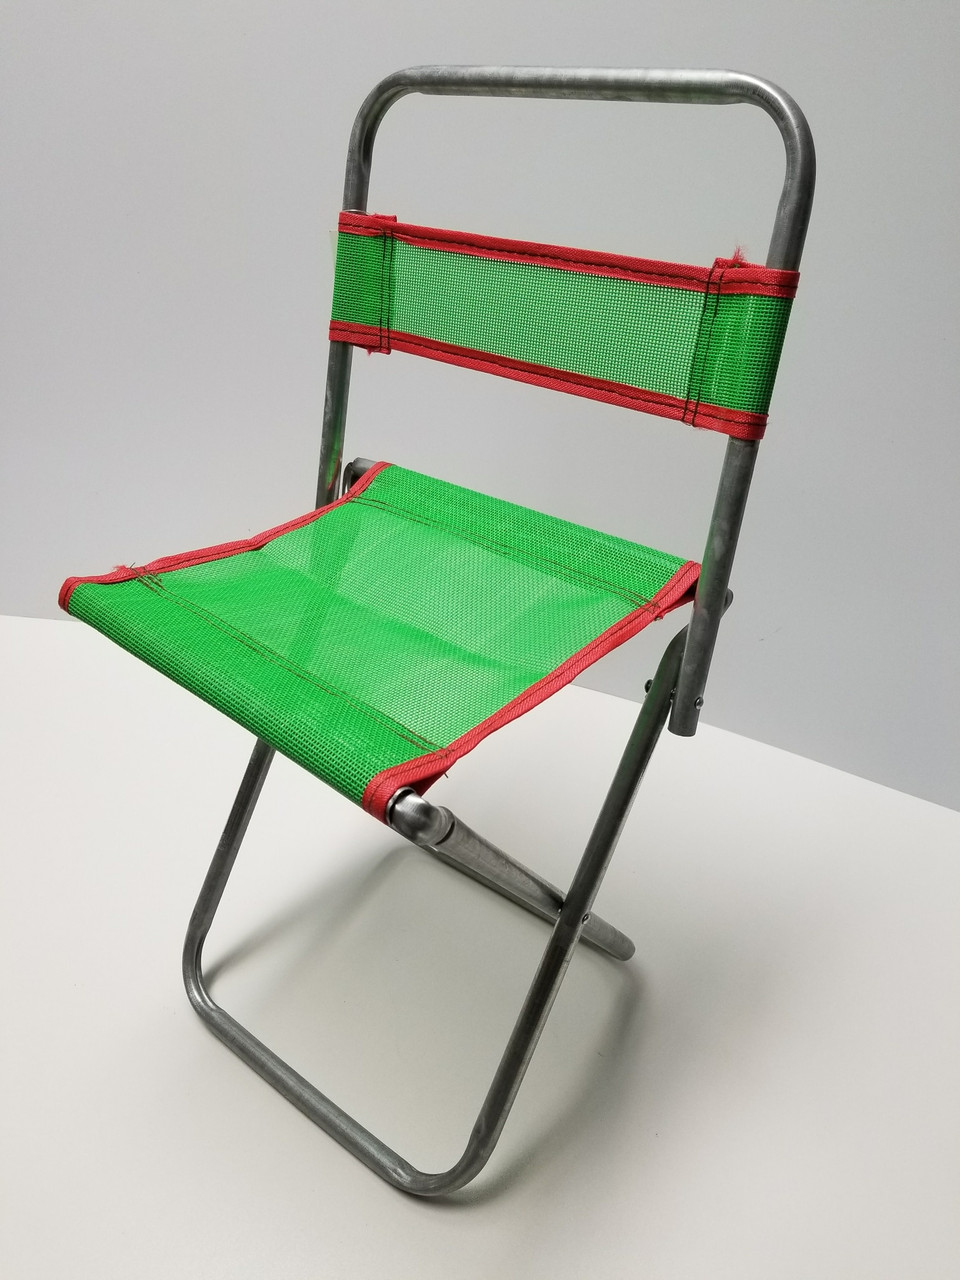 18 Inch Green Portable Mini Folding Camp Chair Canvass Bbq Seat